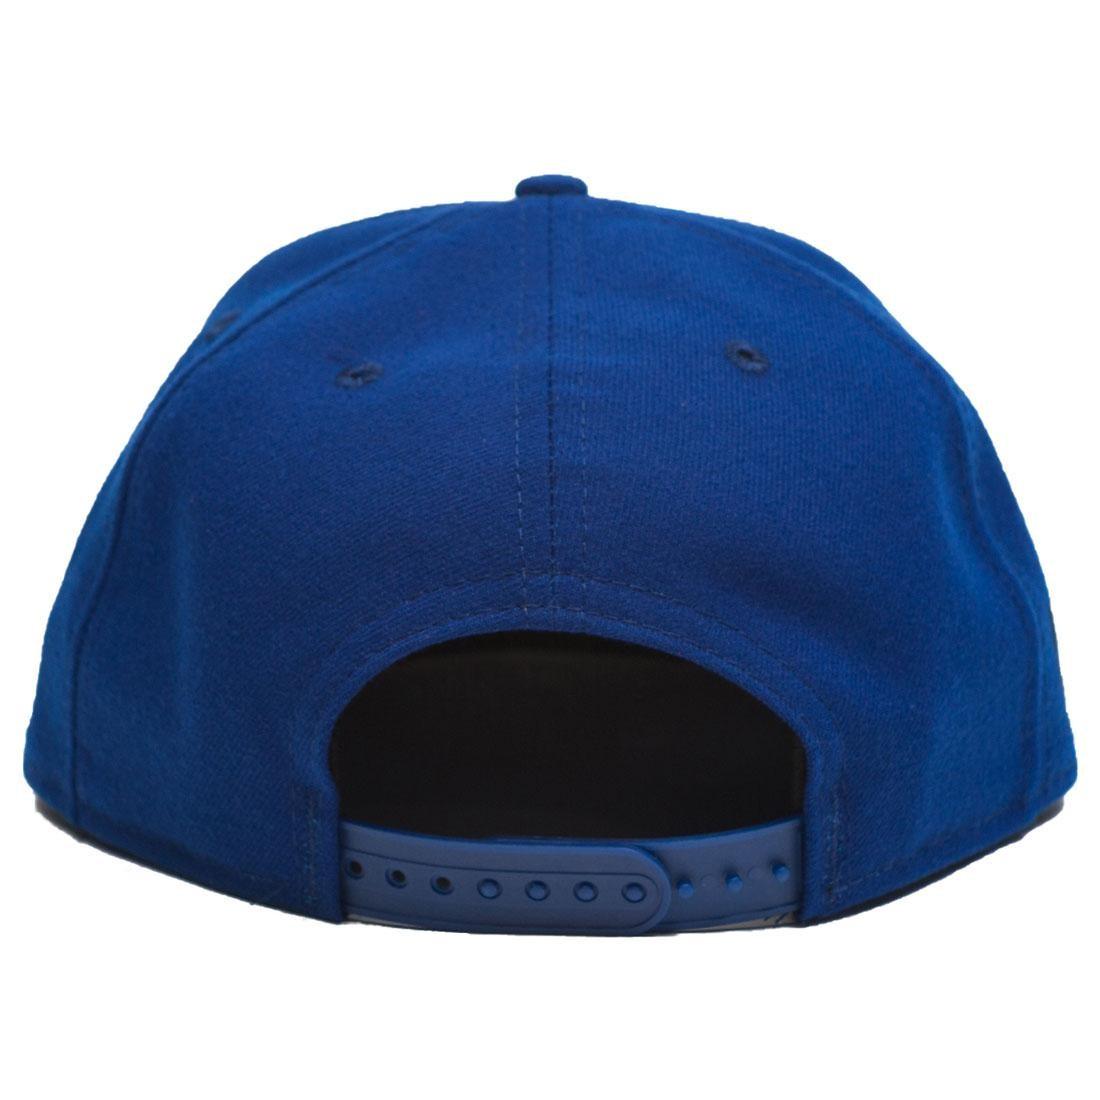 4207c4b97fcdd BAIT x NBA X New Era 9Fifty Golden State Warriors OTC Snapback Cap (blue)